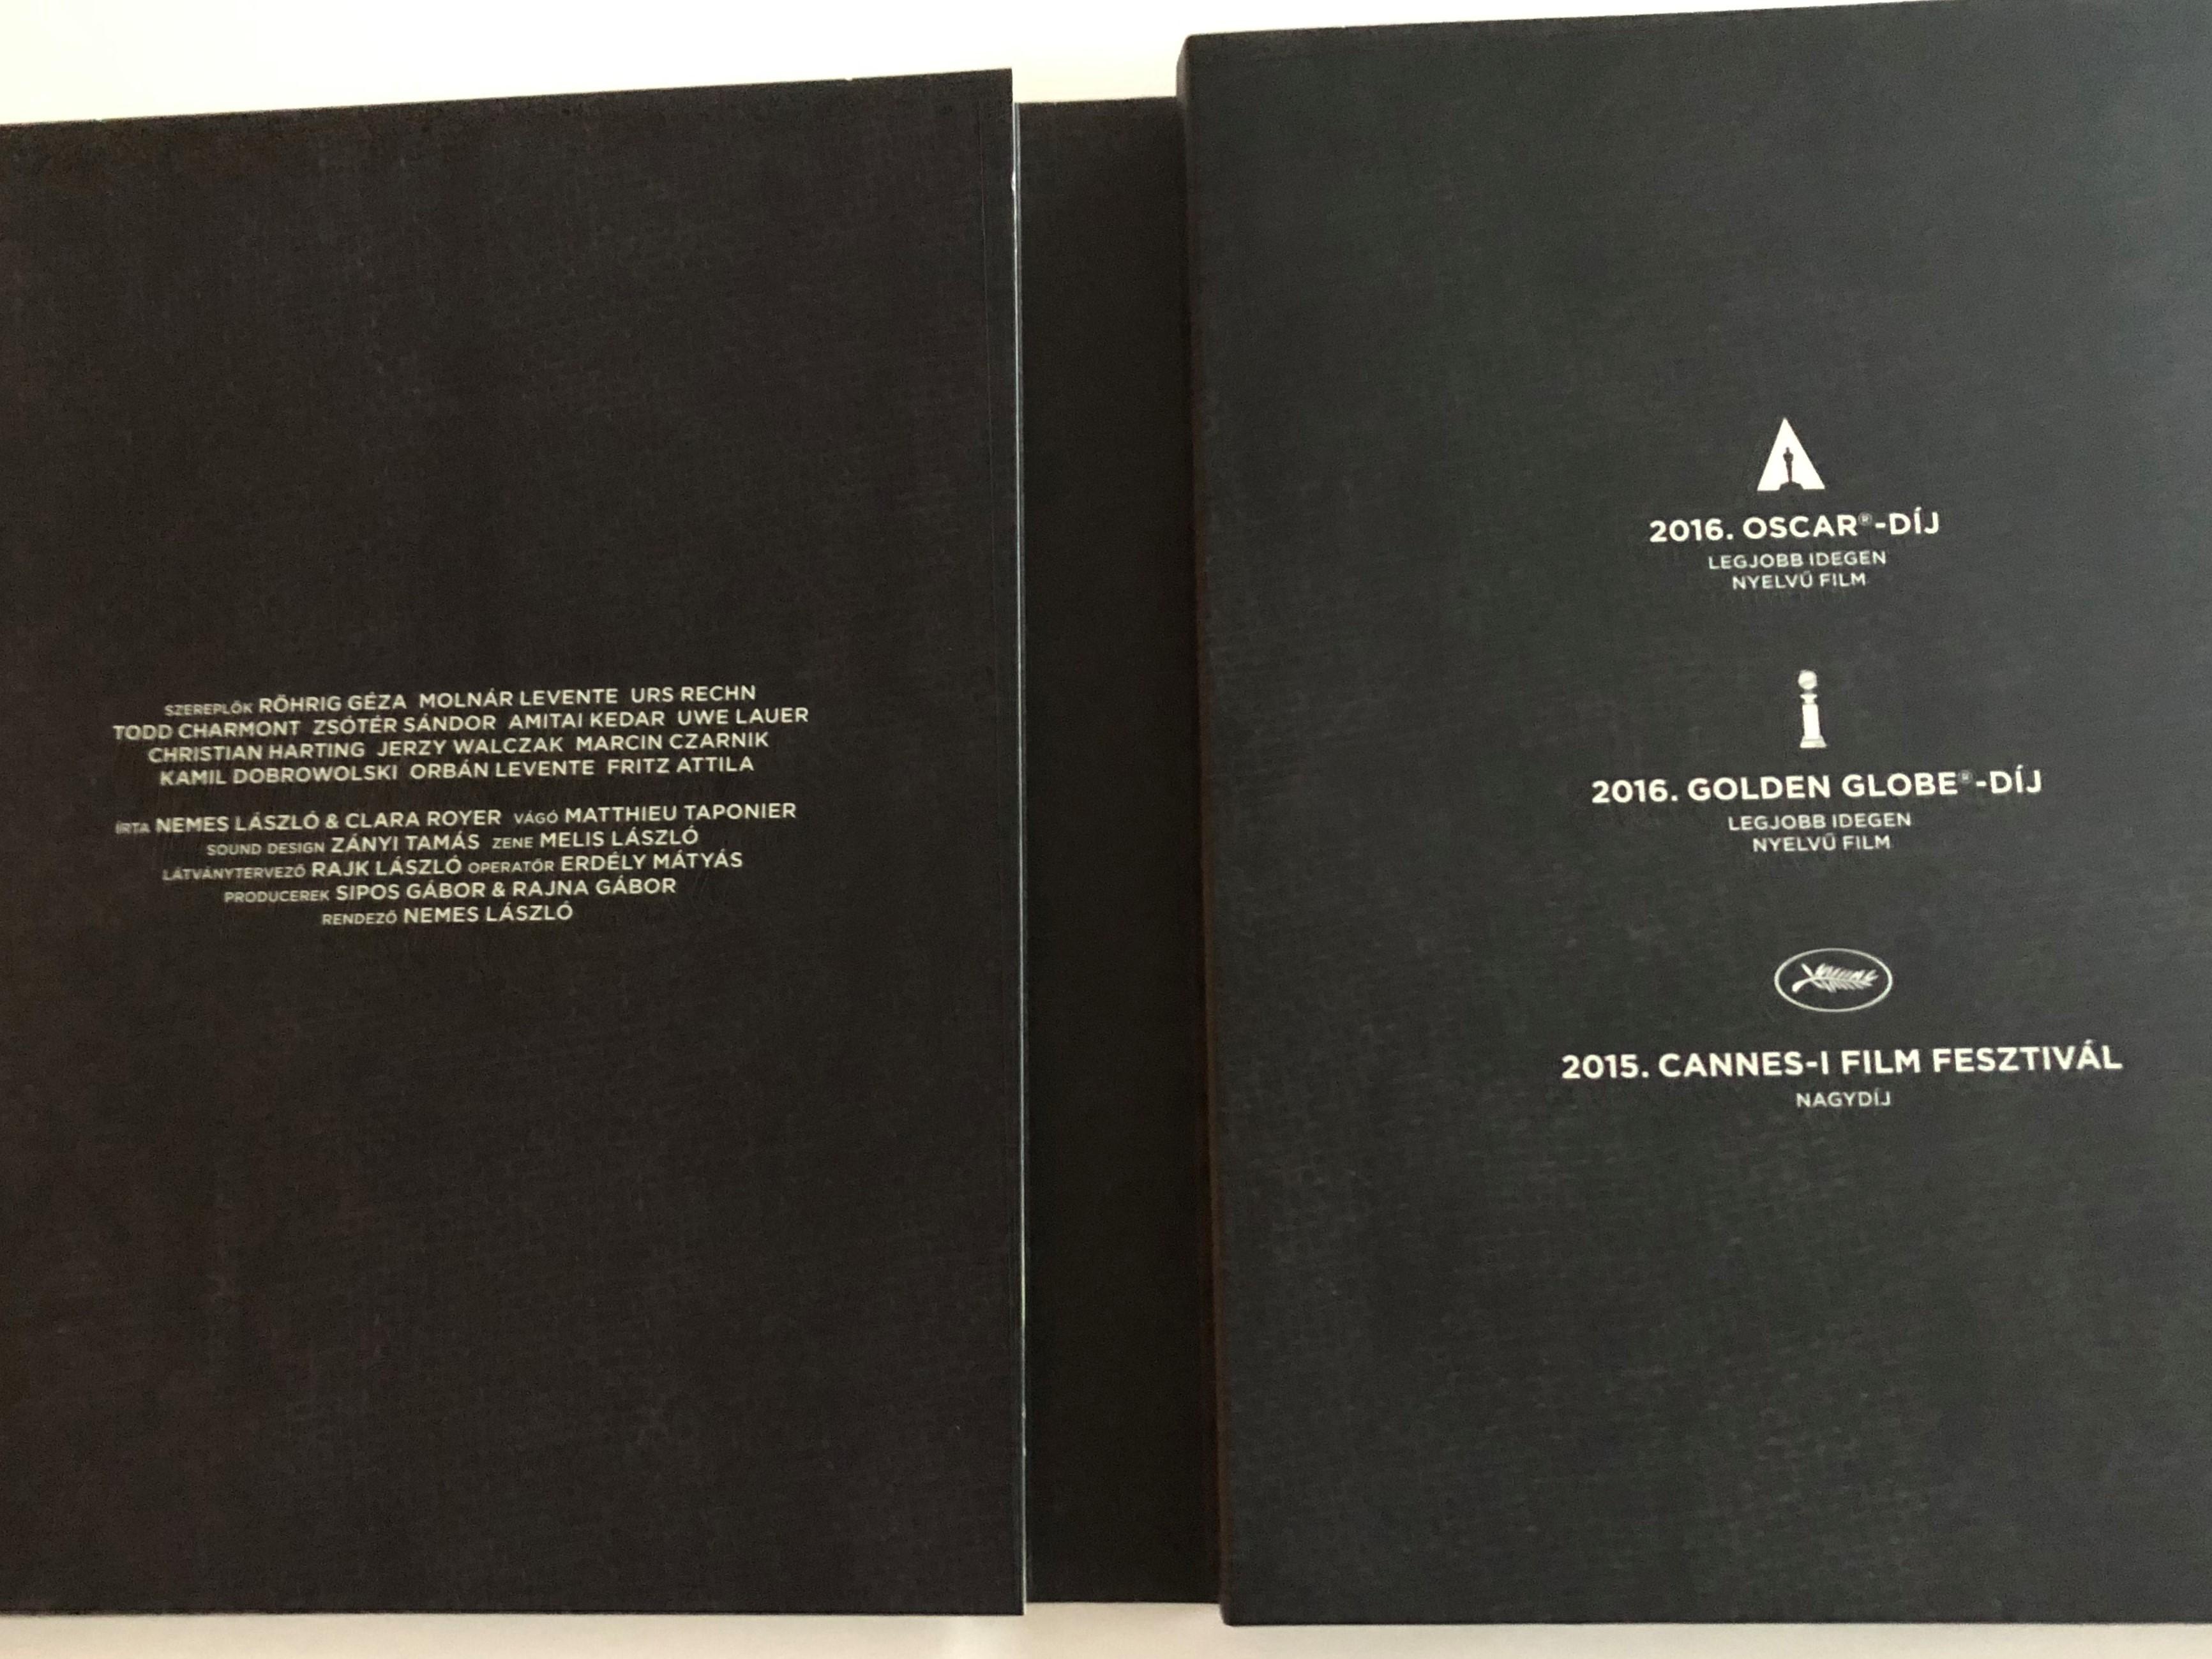 saul-fia-son-of-saul-bluray-dvd-2015-limited-edition-5.jpg